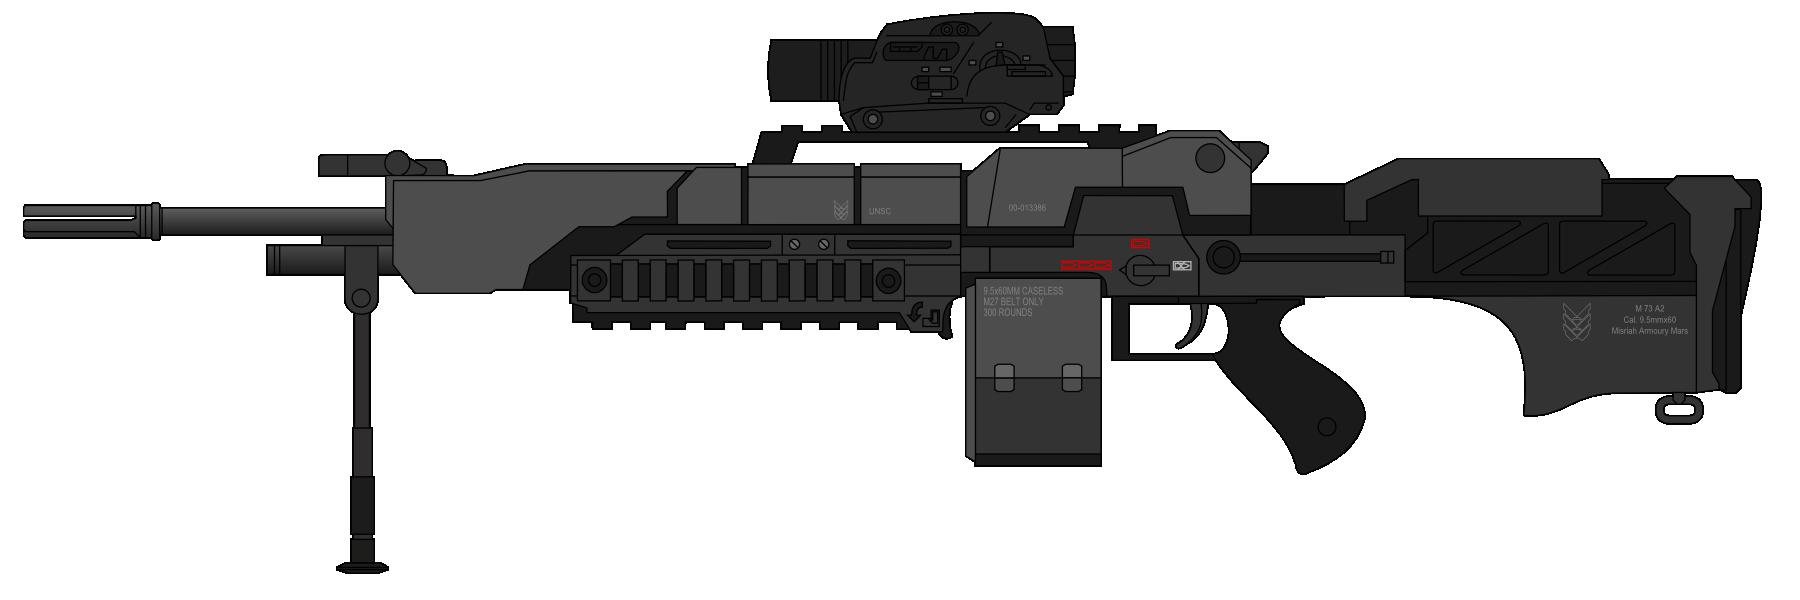 machine gun png